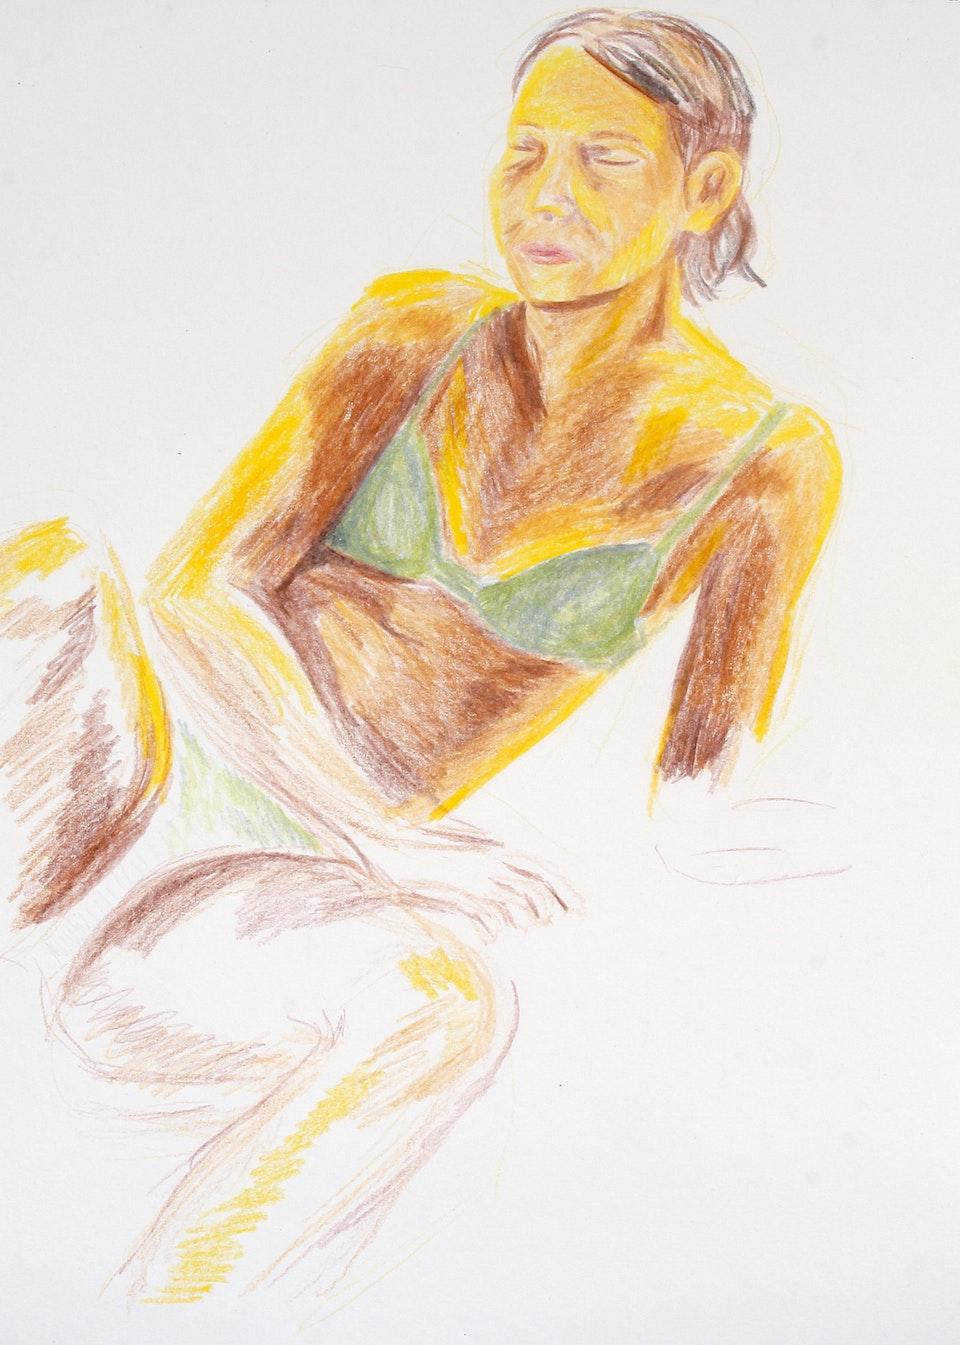 Portraits - Mathilda Young - 2020 - Pencil on Paper - 21 x 29cm A4